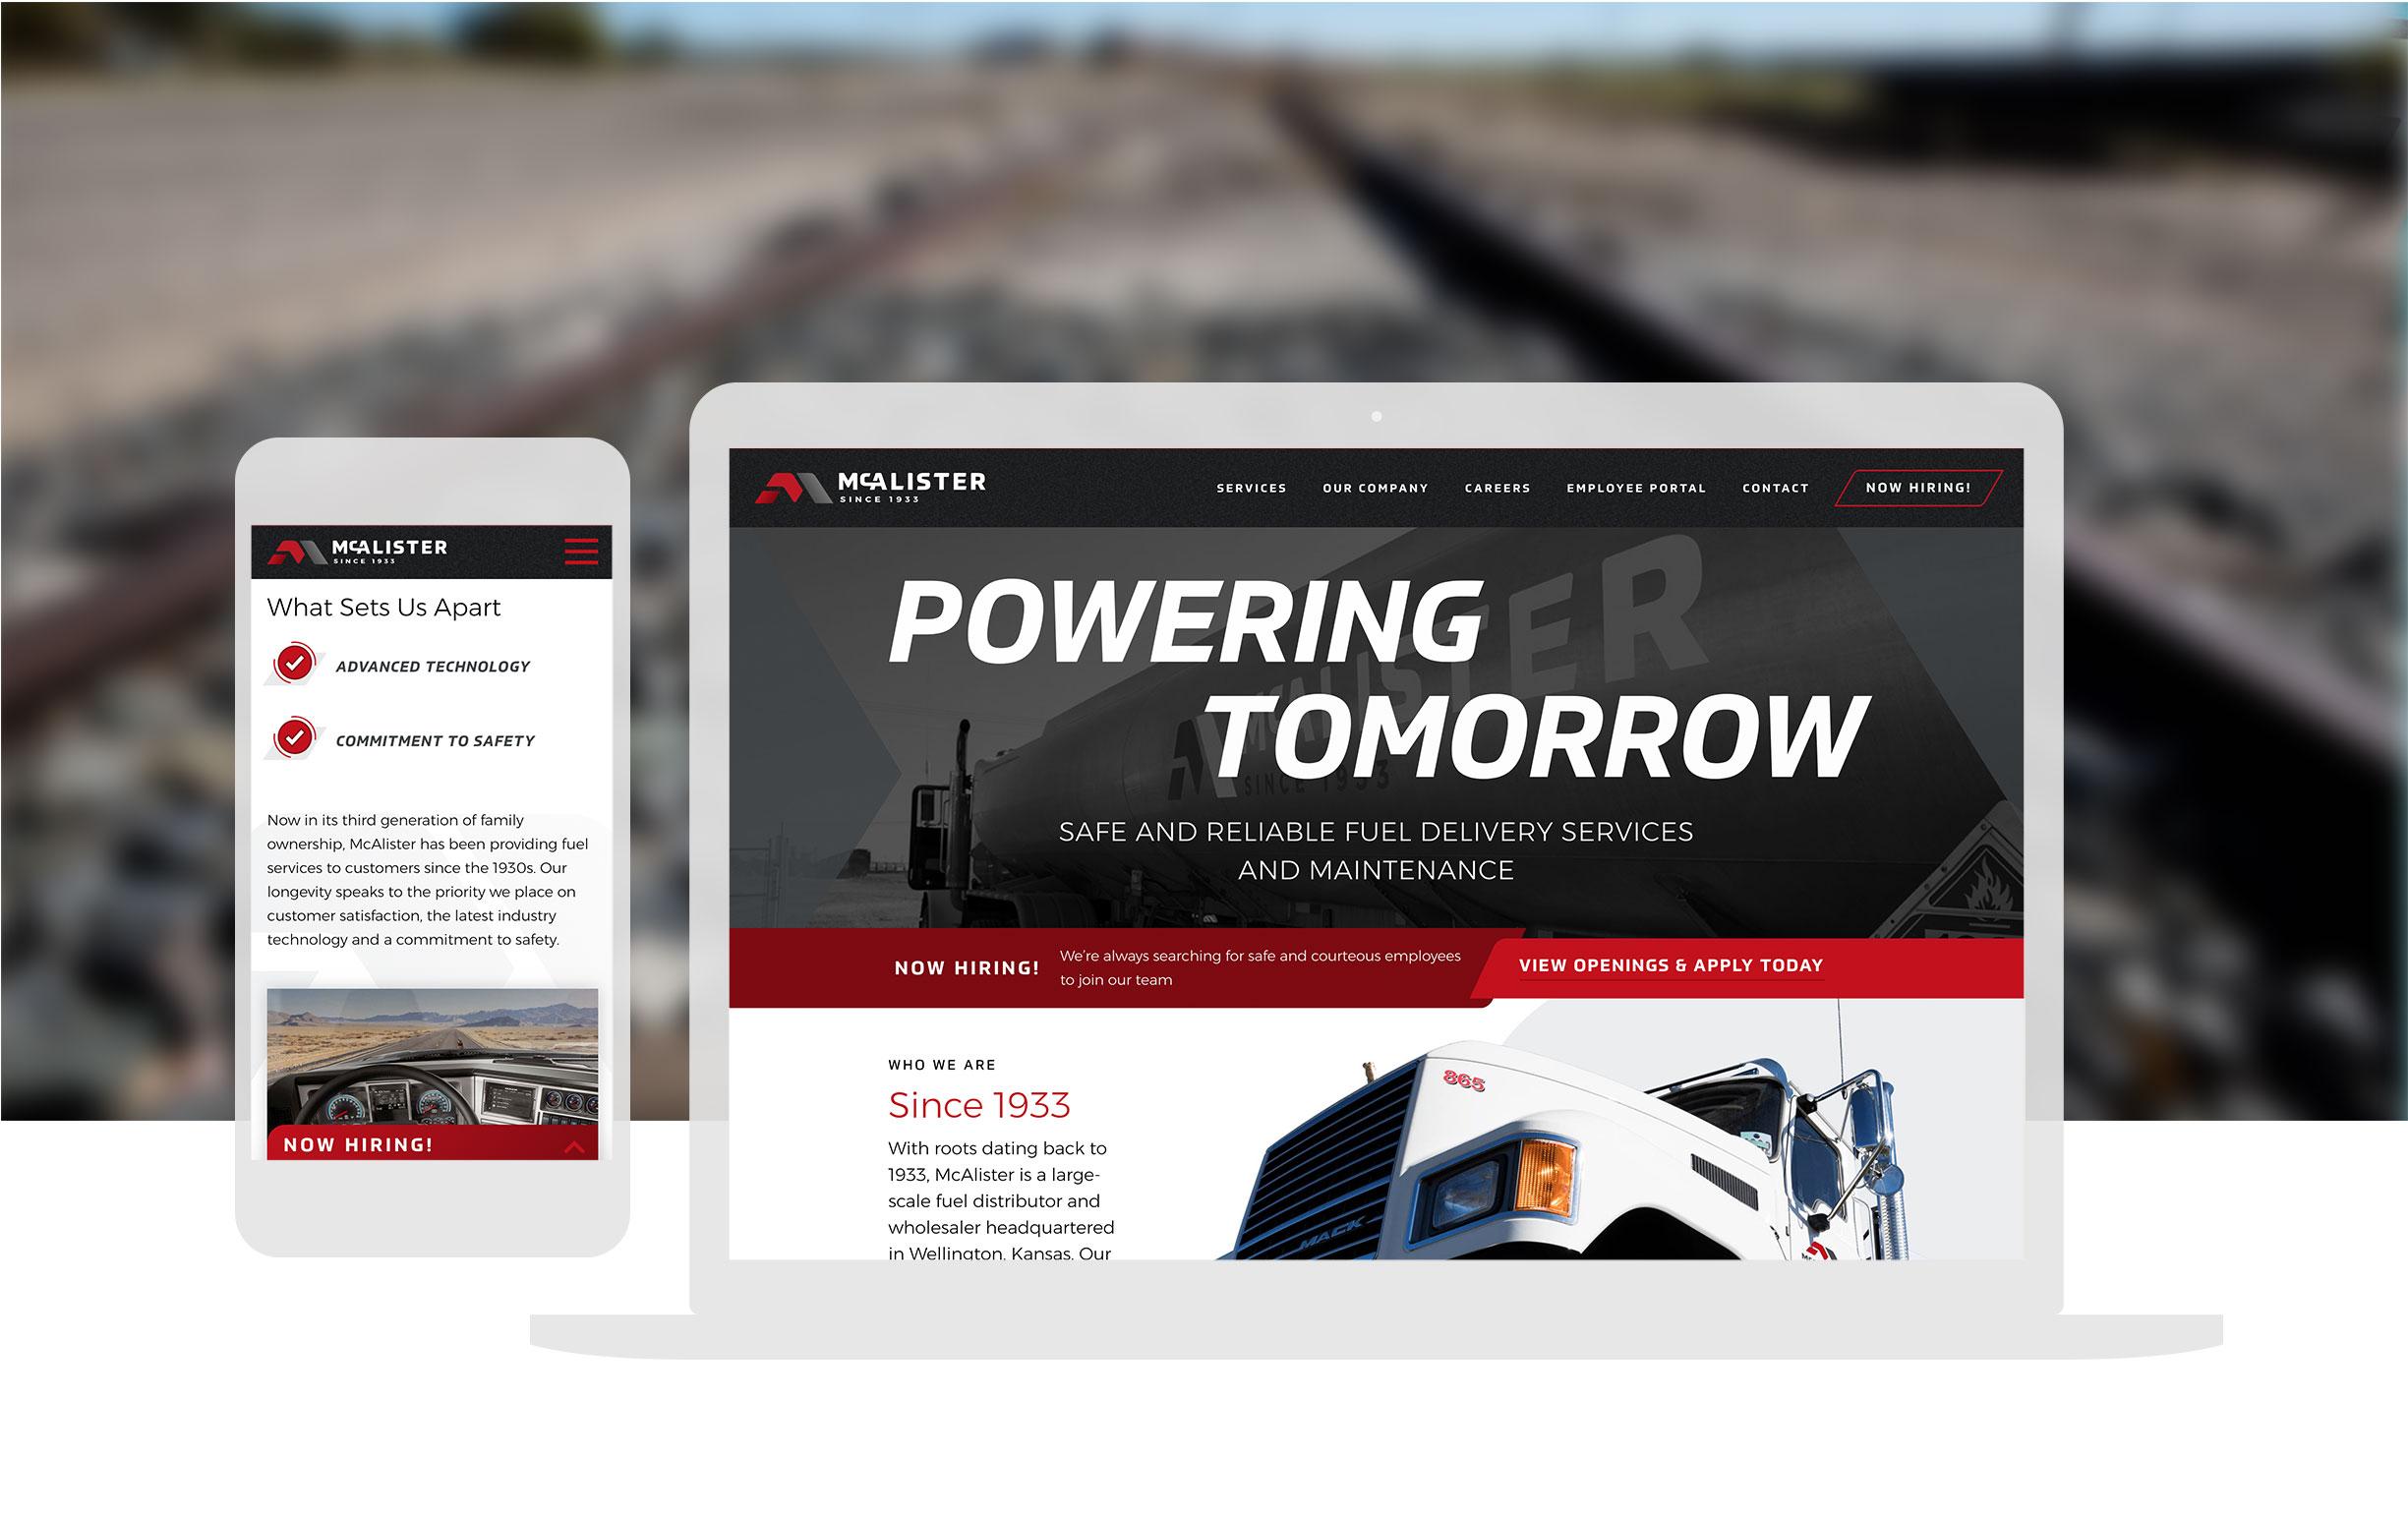 Oilandfuel Website Design And Development Cassandrabryandesign 2